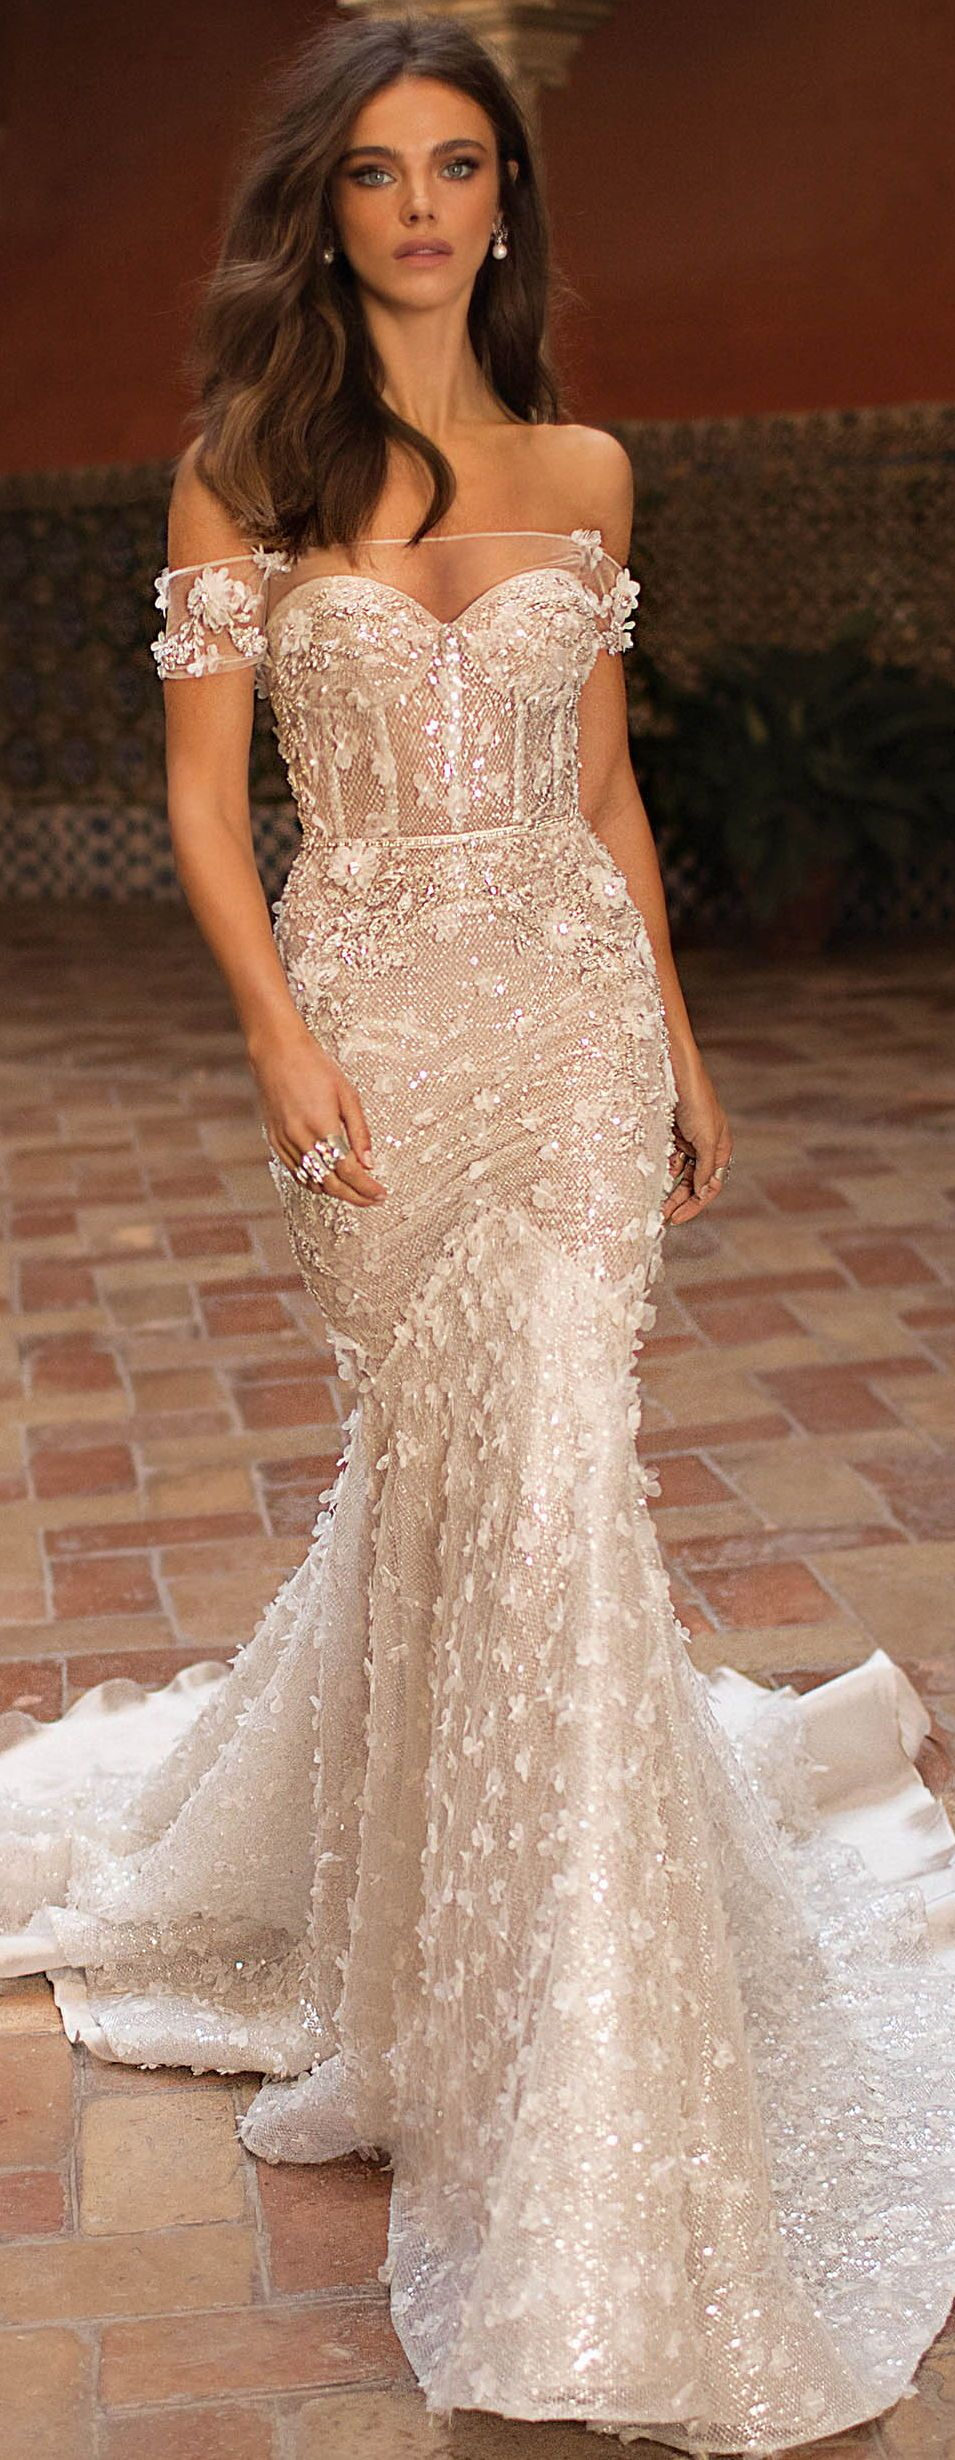 Wedding dress by BERTA Bridal Mermaid off the shoulder